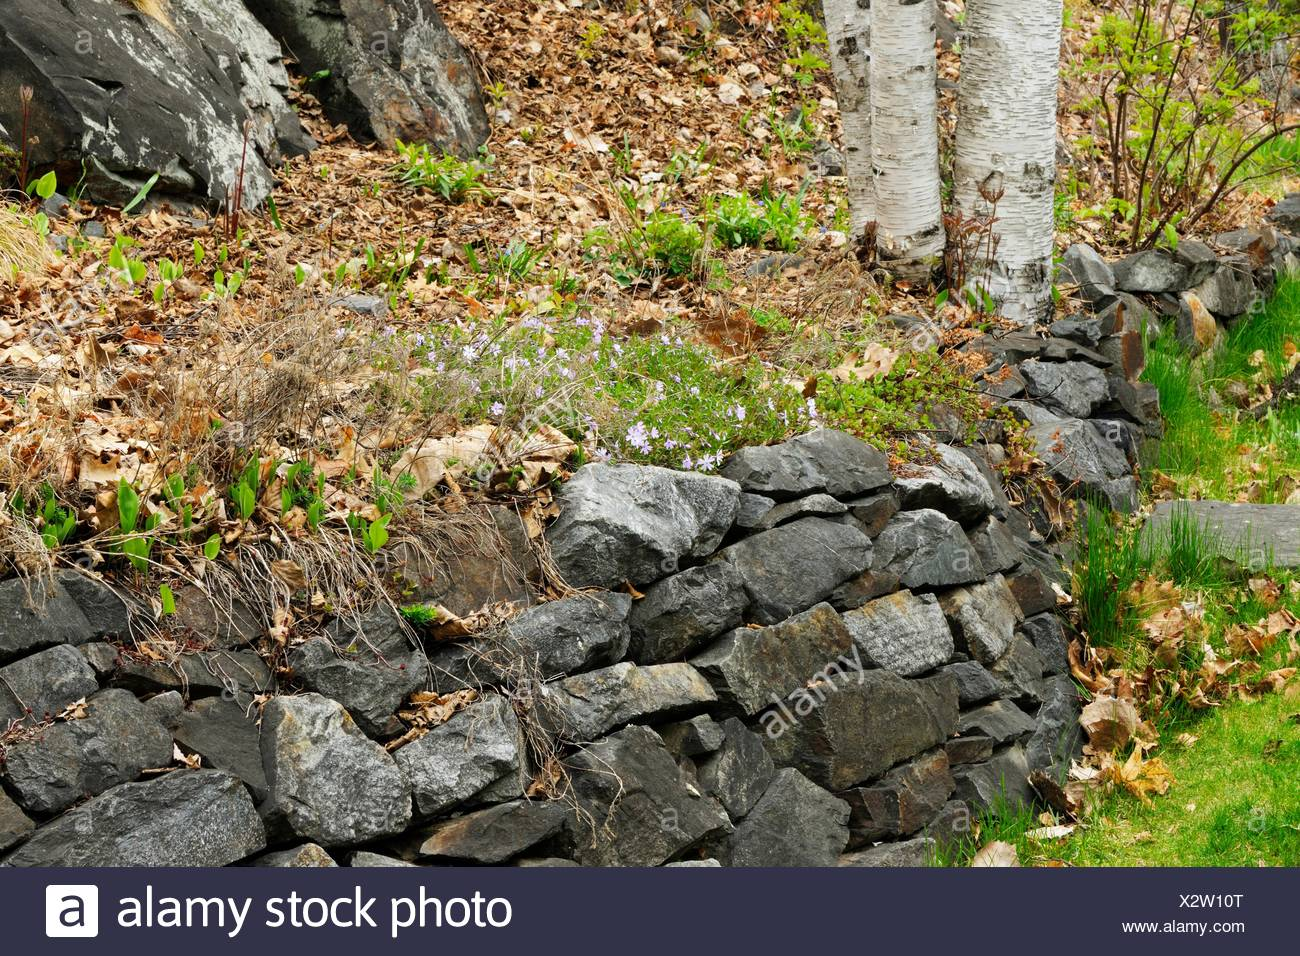 suburban residence gardens rock retaining wall and hillside